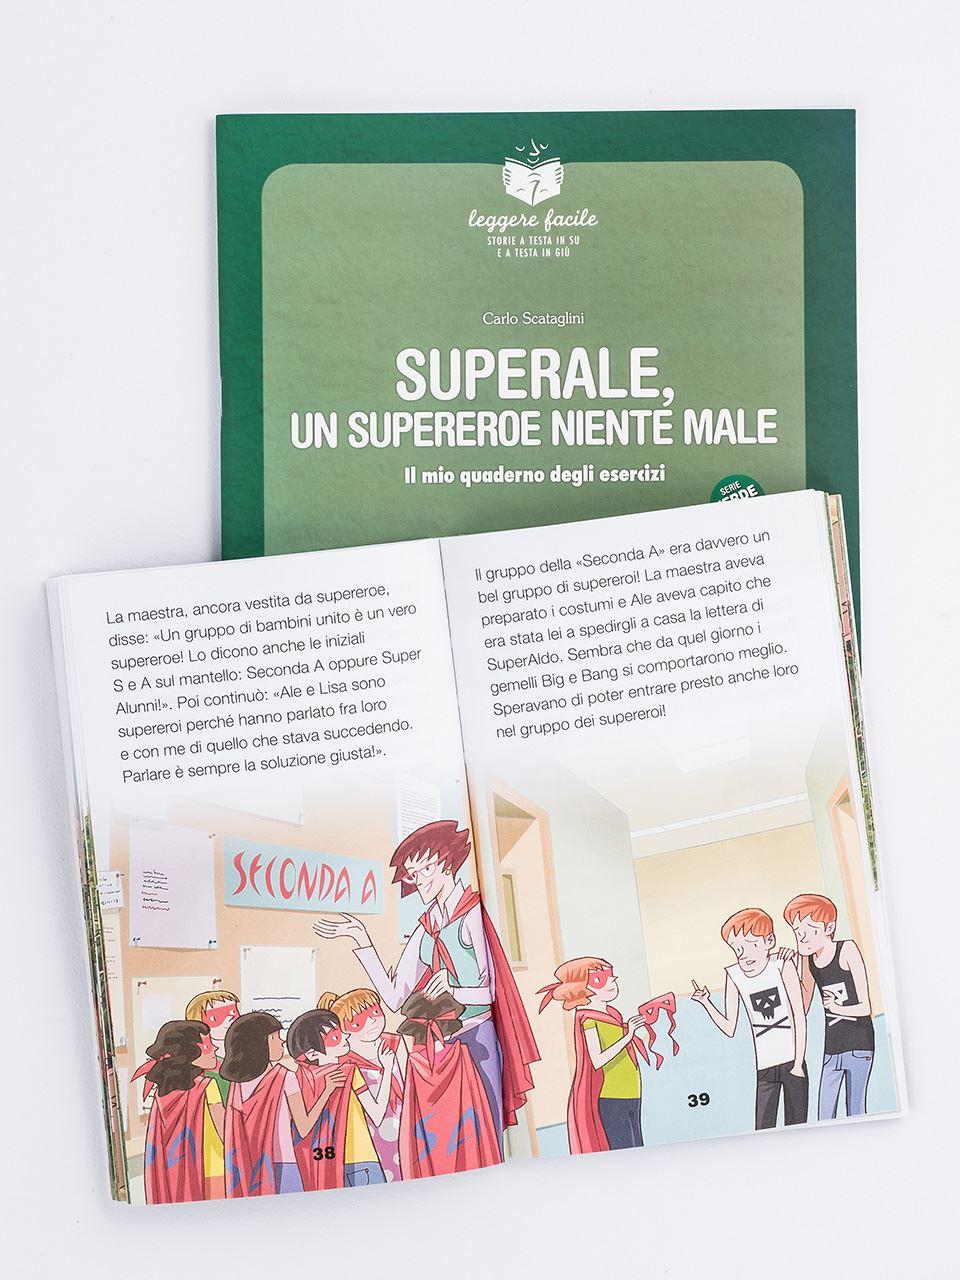 SuperAle, un supereroe niente male - Libri - Erickson 2